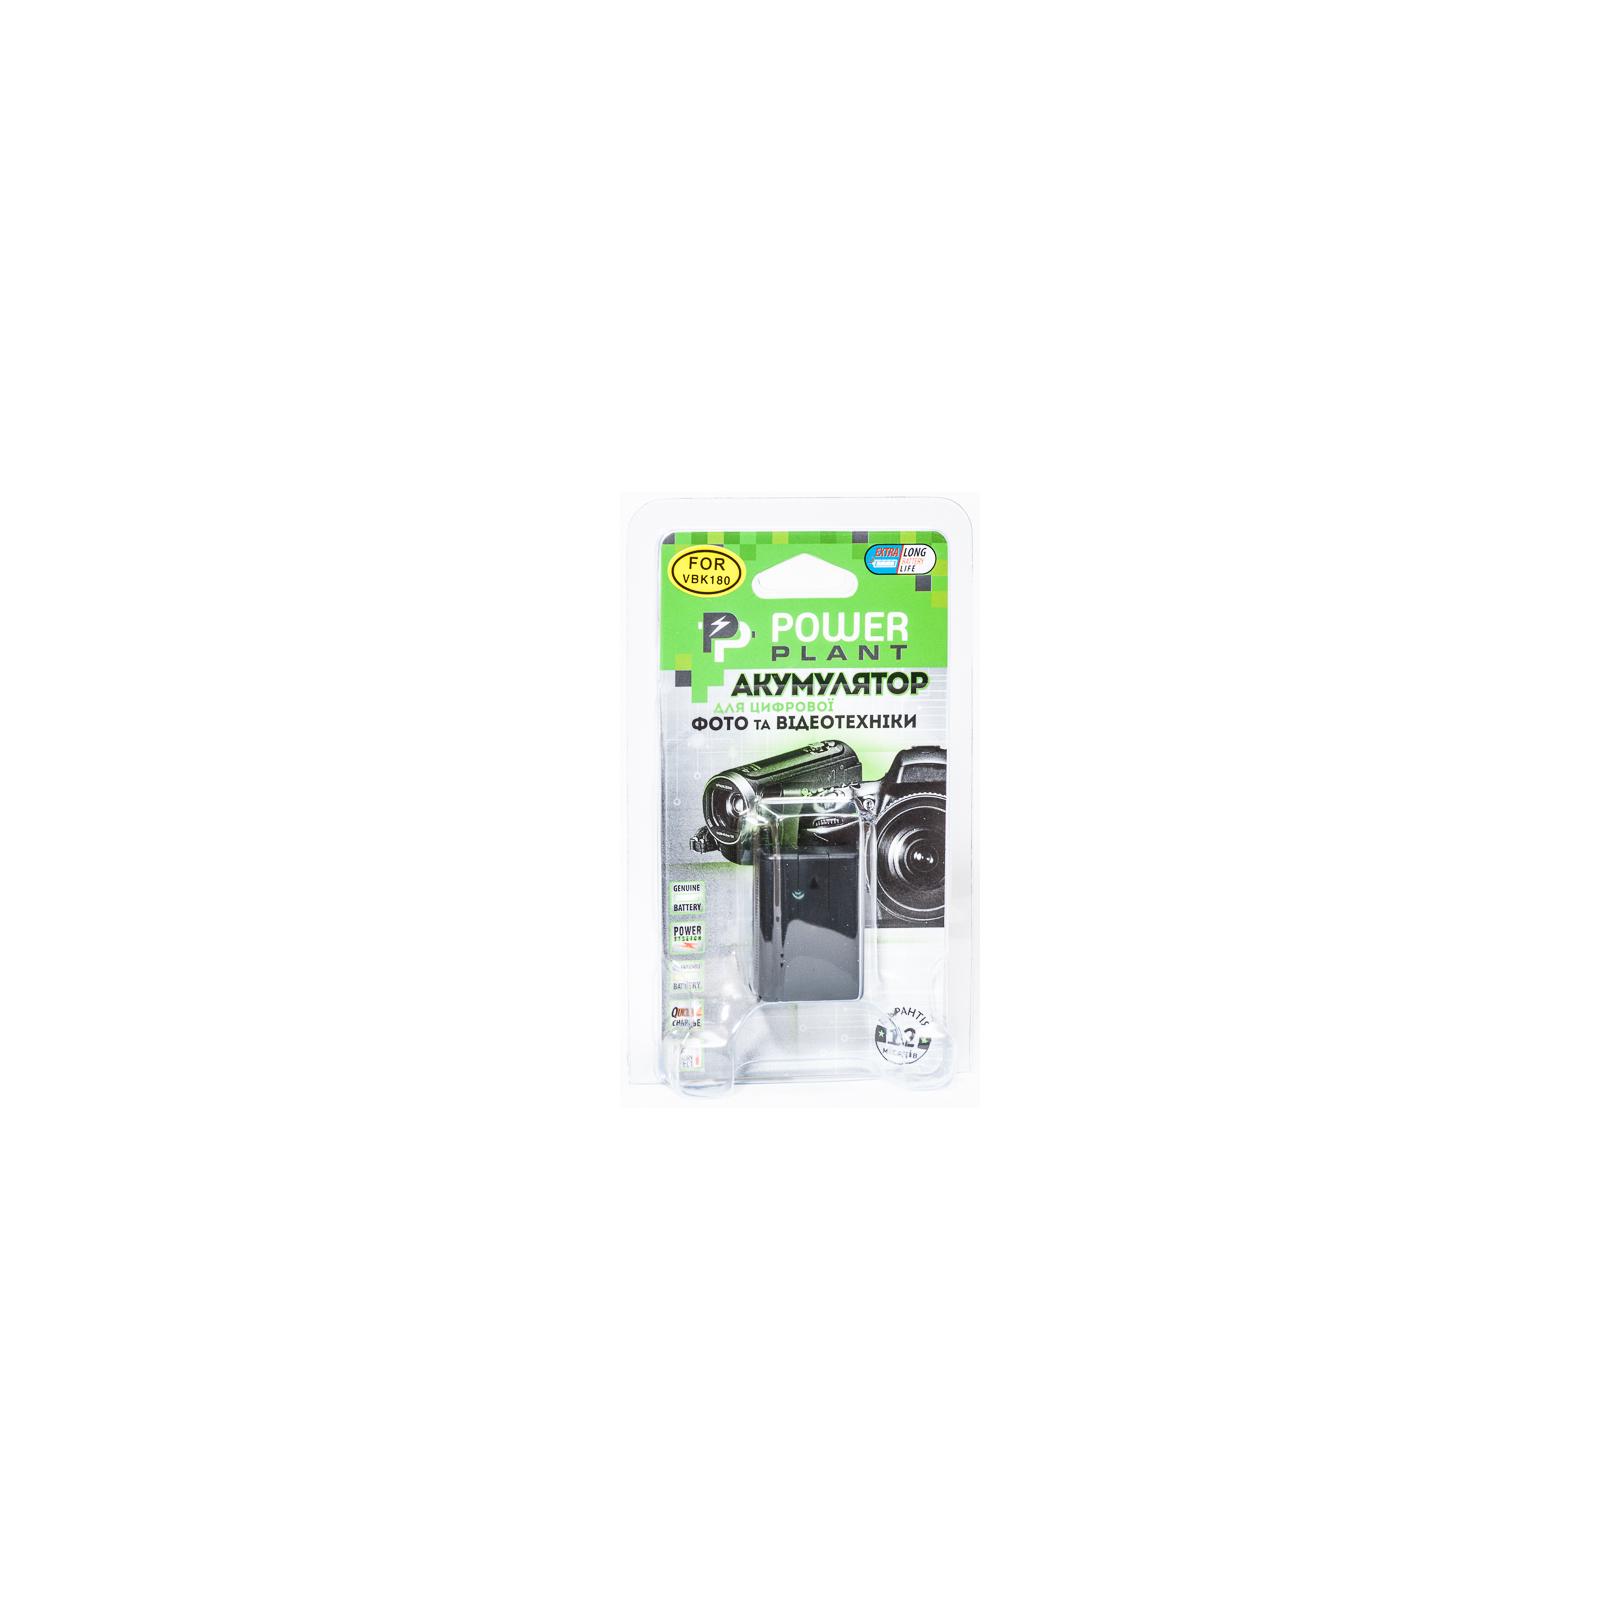 Аккумулятор к фото/видео PowerPlant Canon BP-970G (DV00DV1369) изображение 2